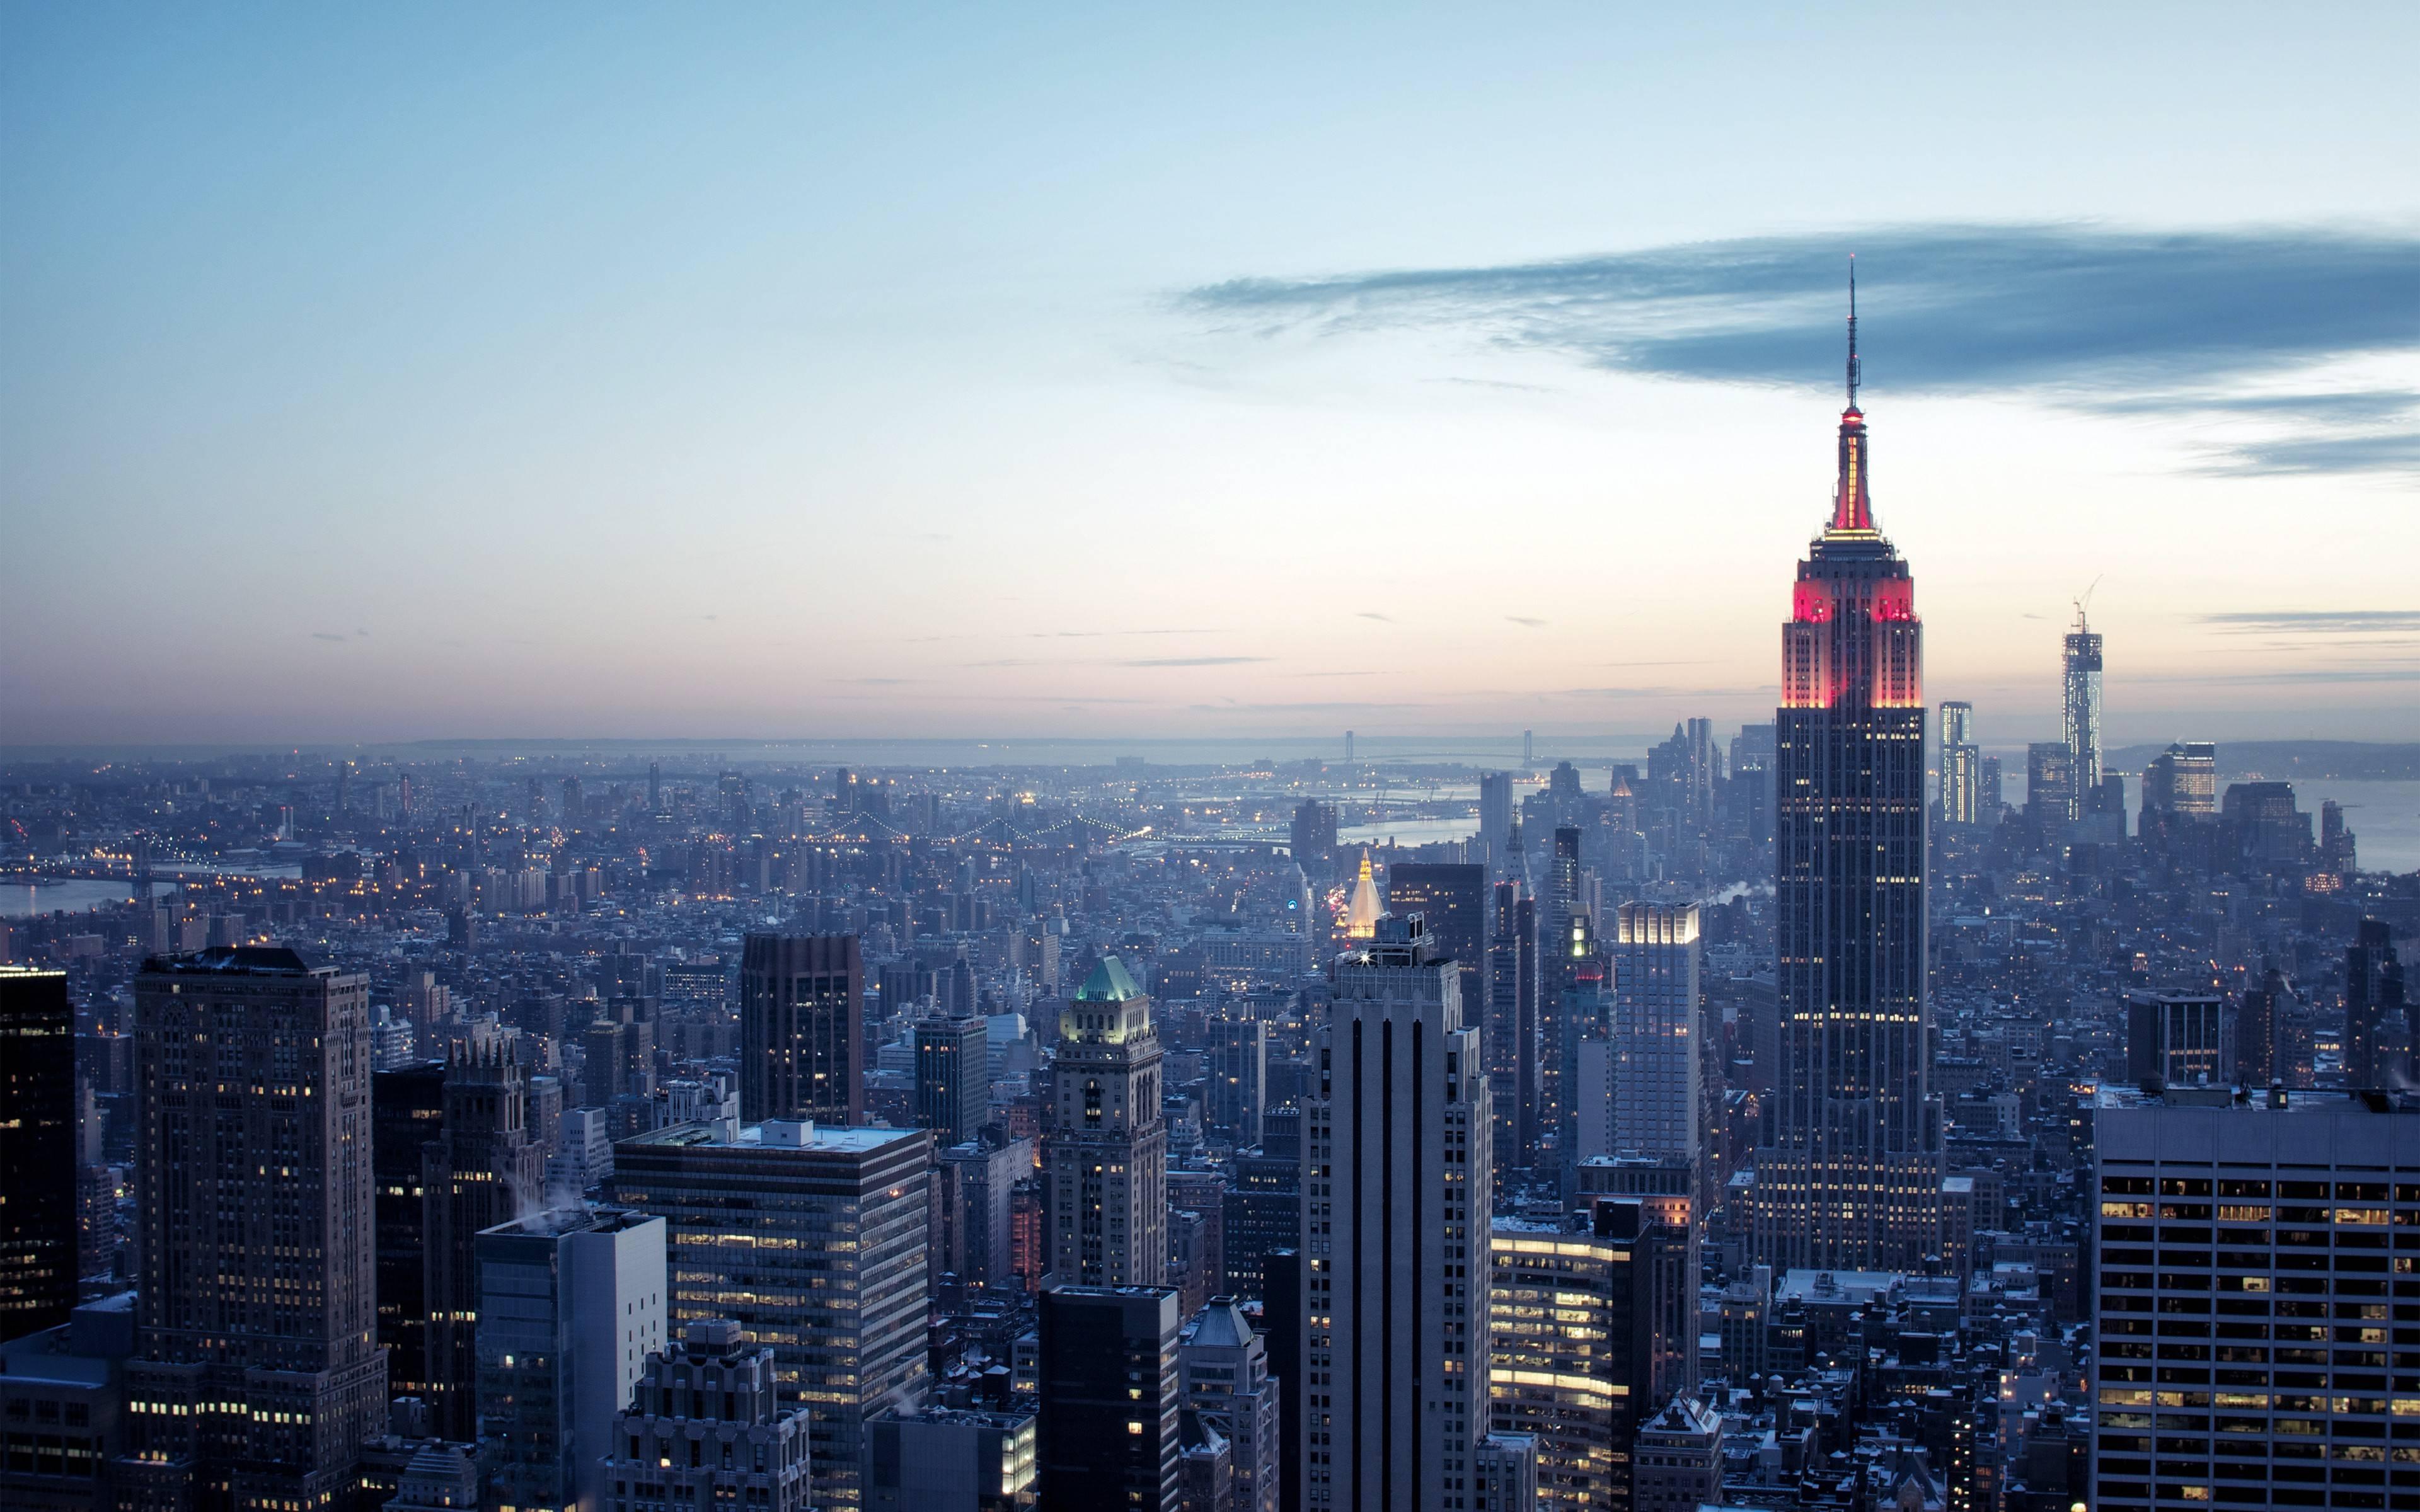 New York City Wallpaper Winter Wallpapers New York Ci...